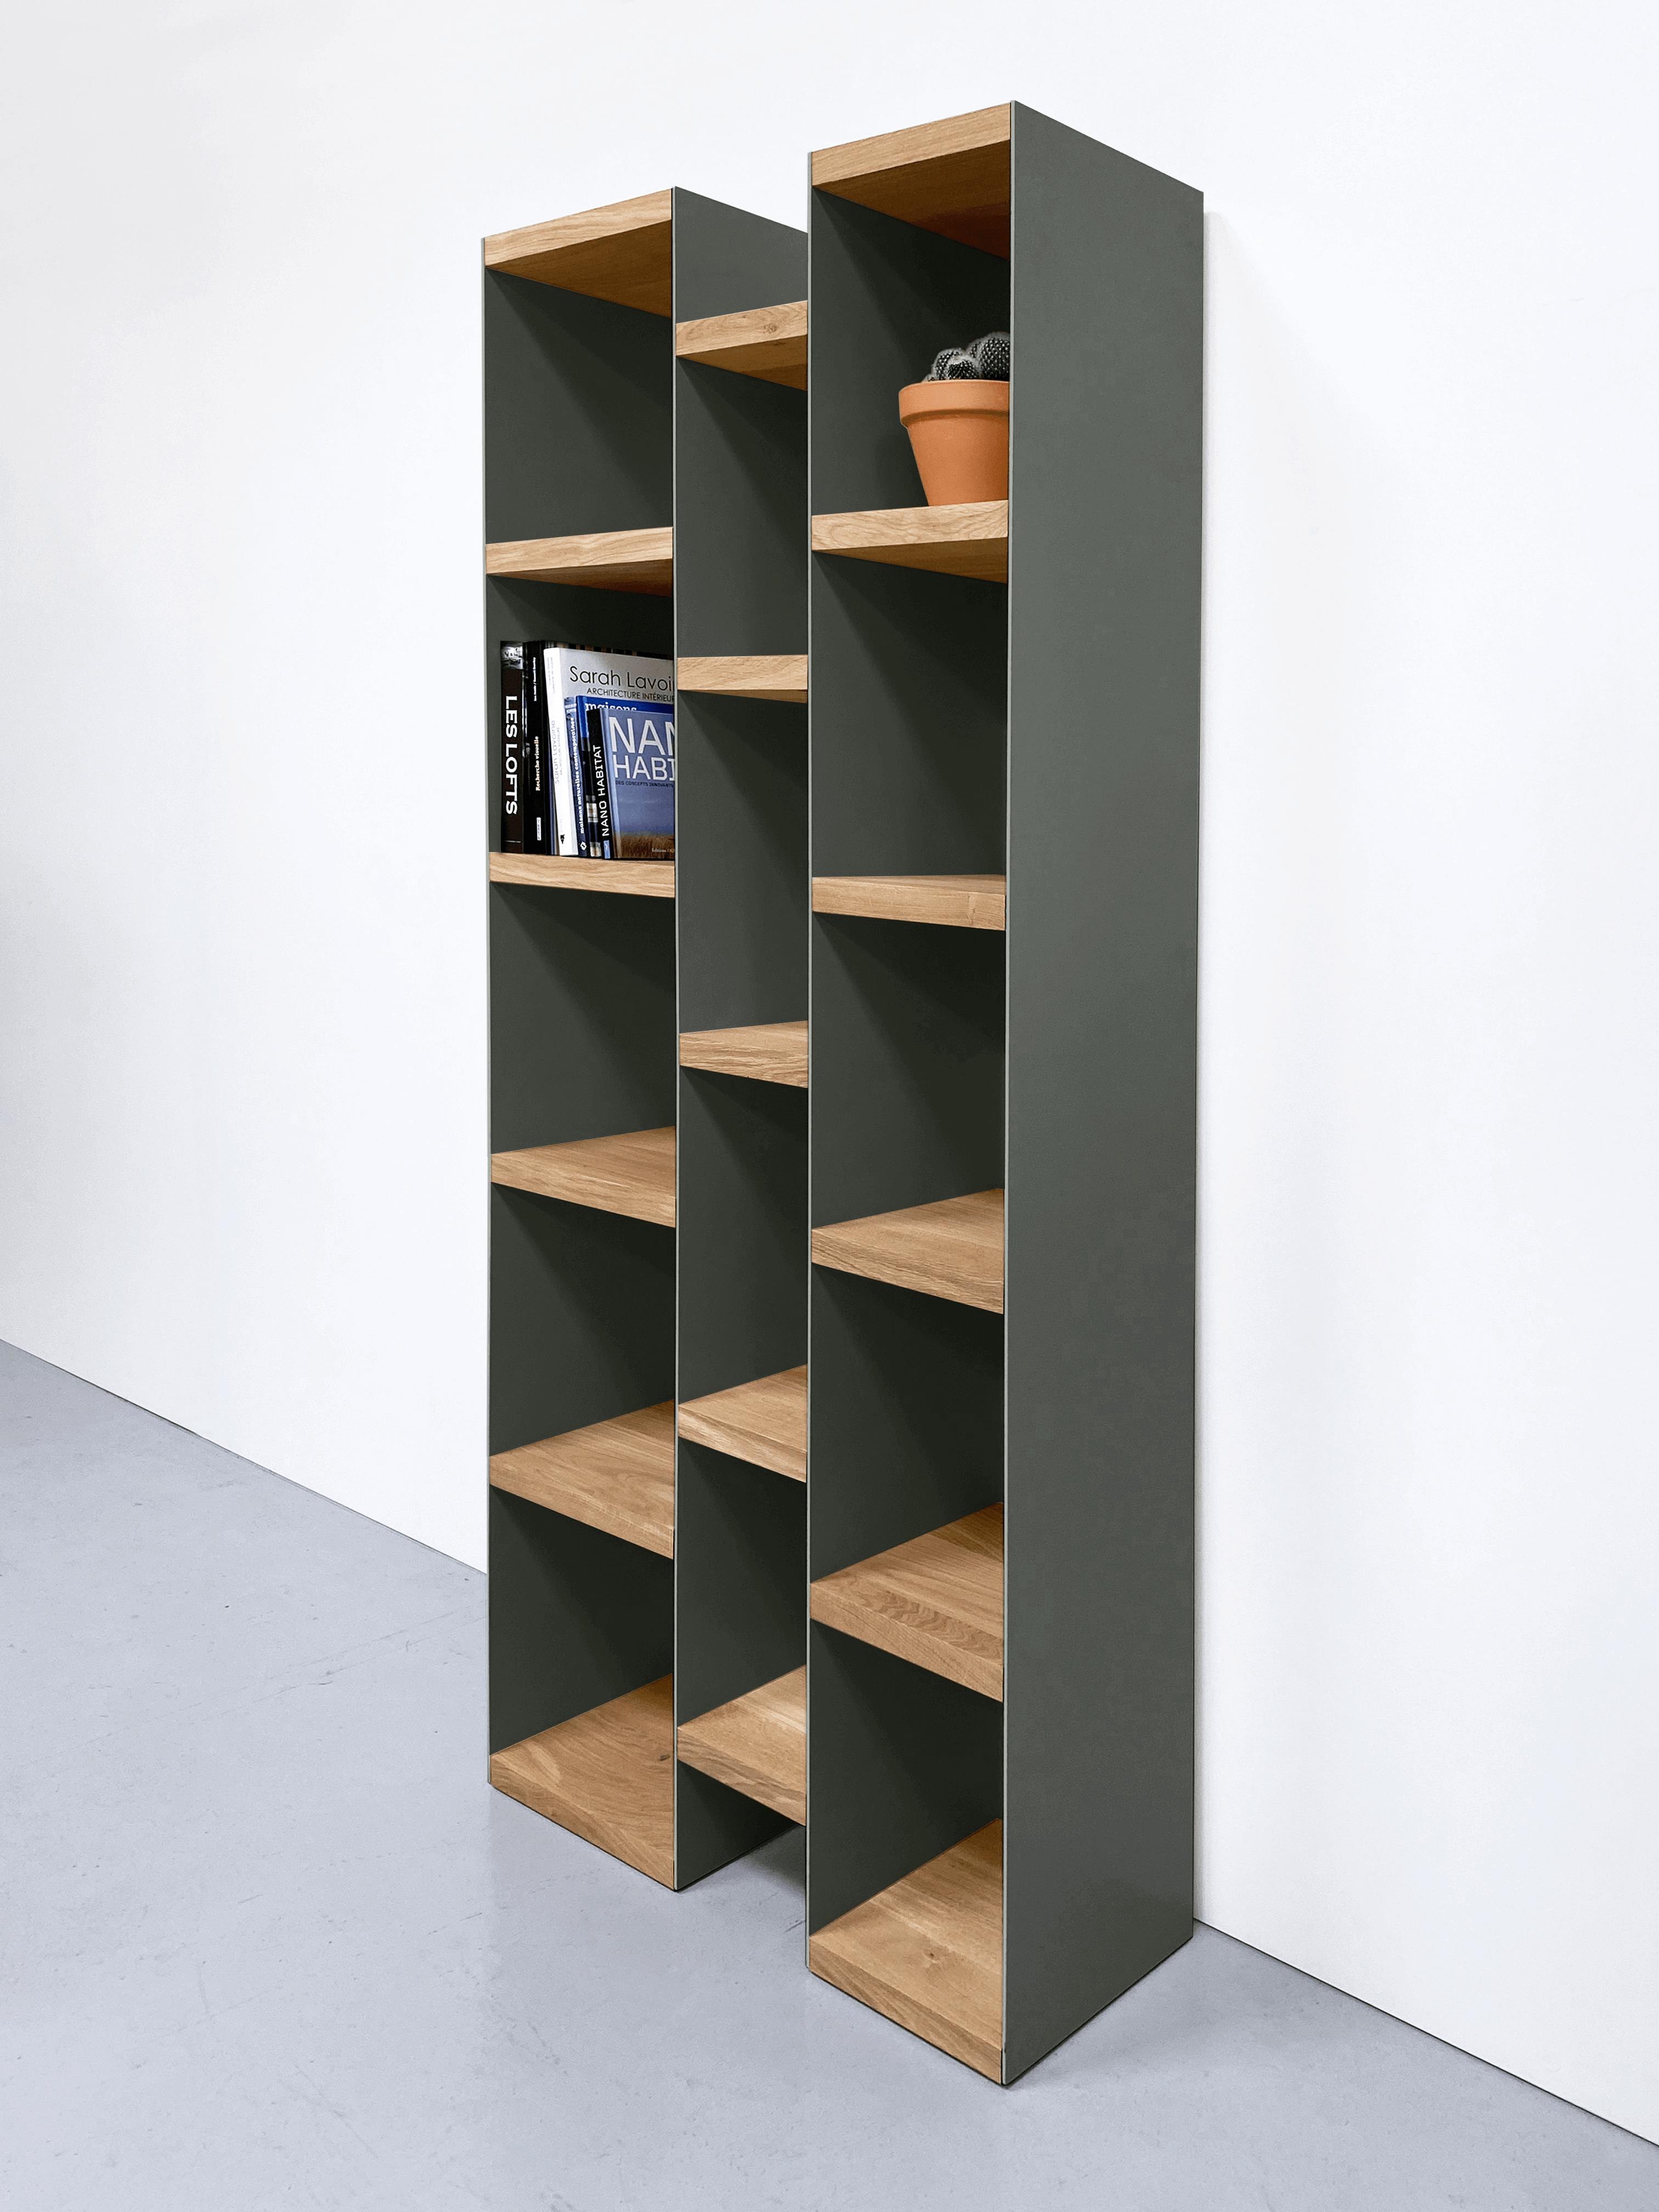 Bibliothèque murale PAGE / Acier kaki et chêne massif / 85 x H 220 x P 35 cm / Artmeta